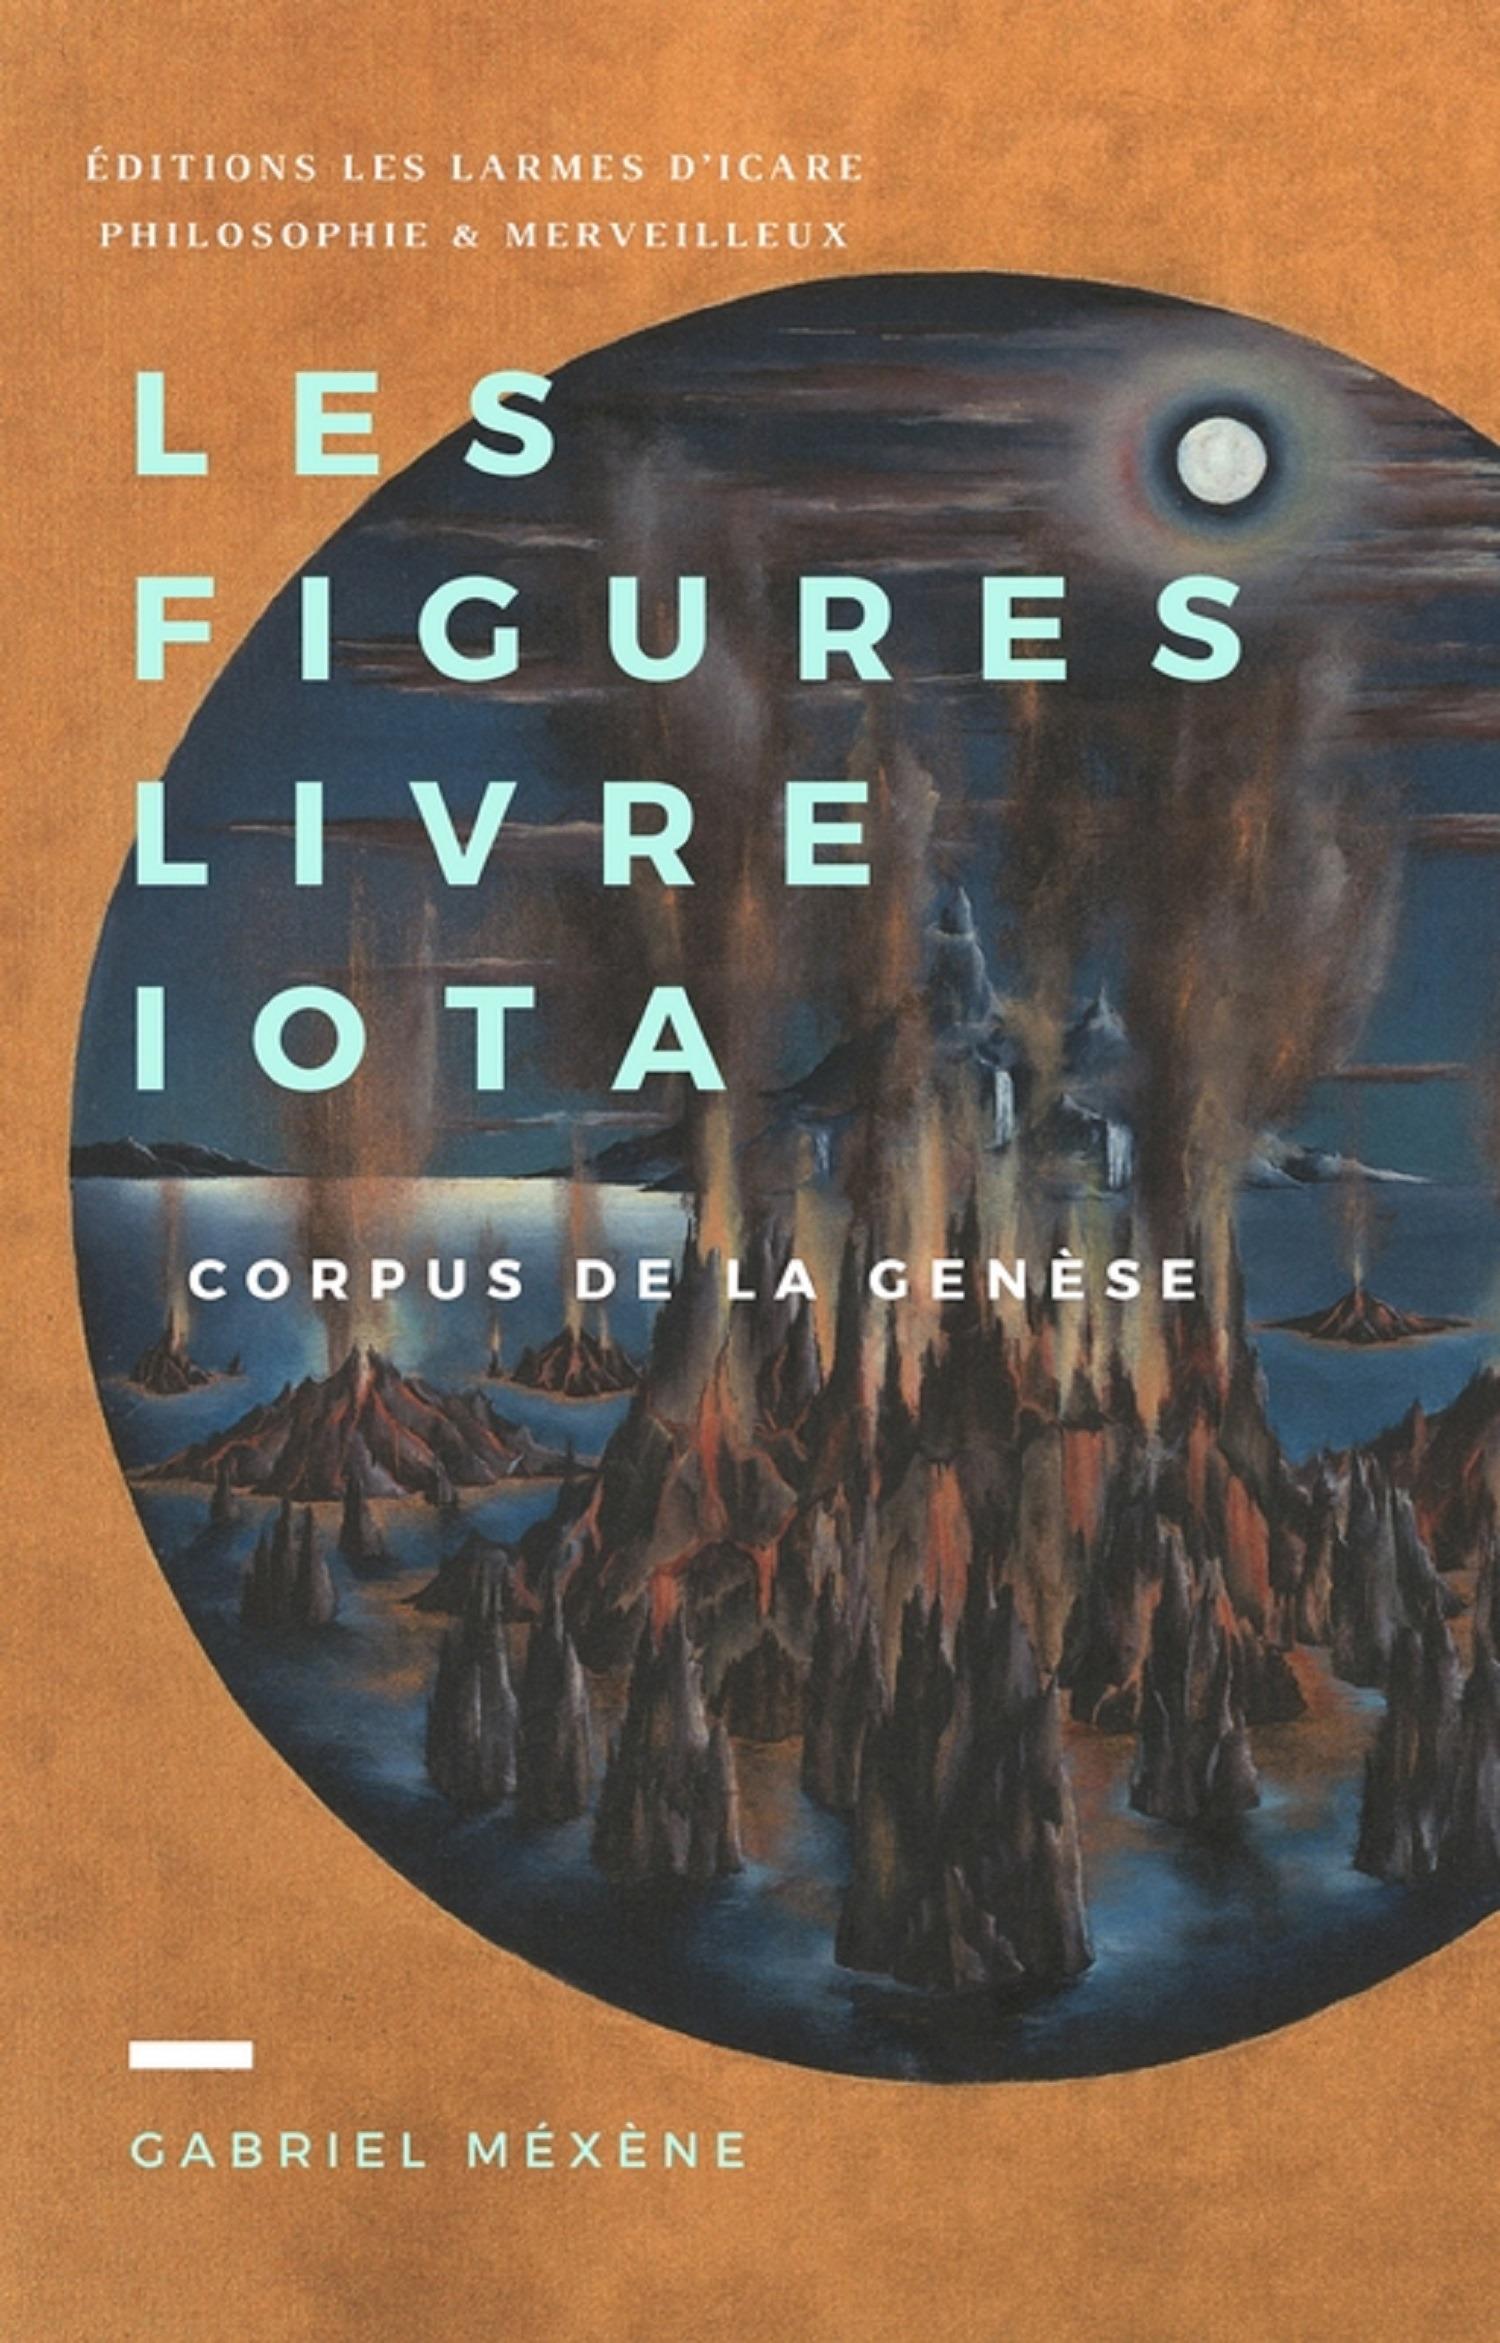 Gabriel Méxène Les Figures, Livre Iota